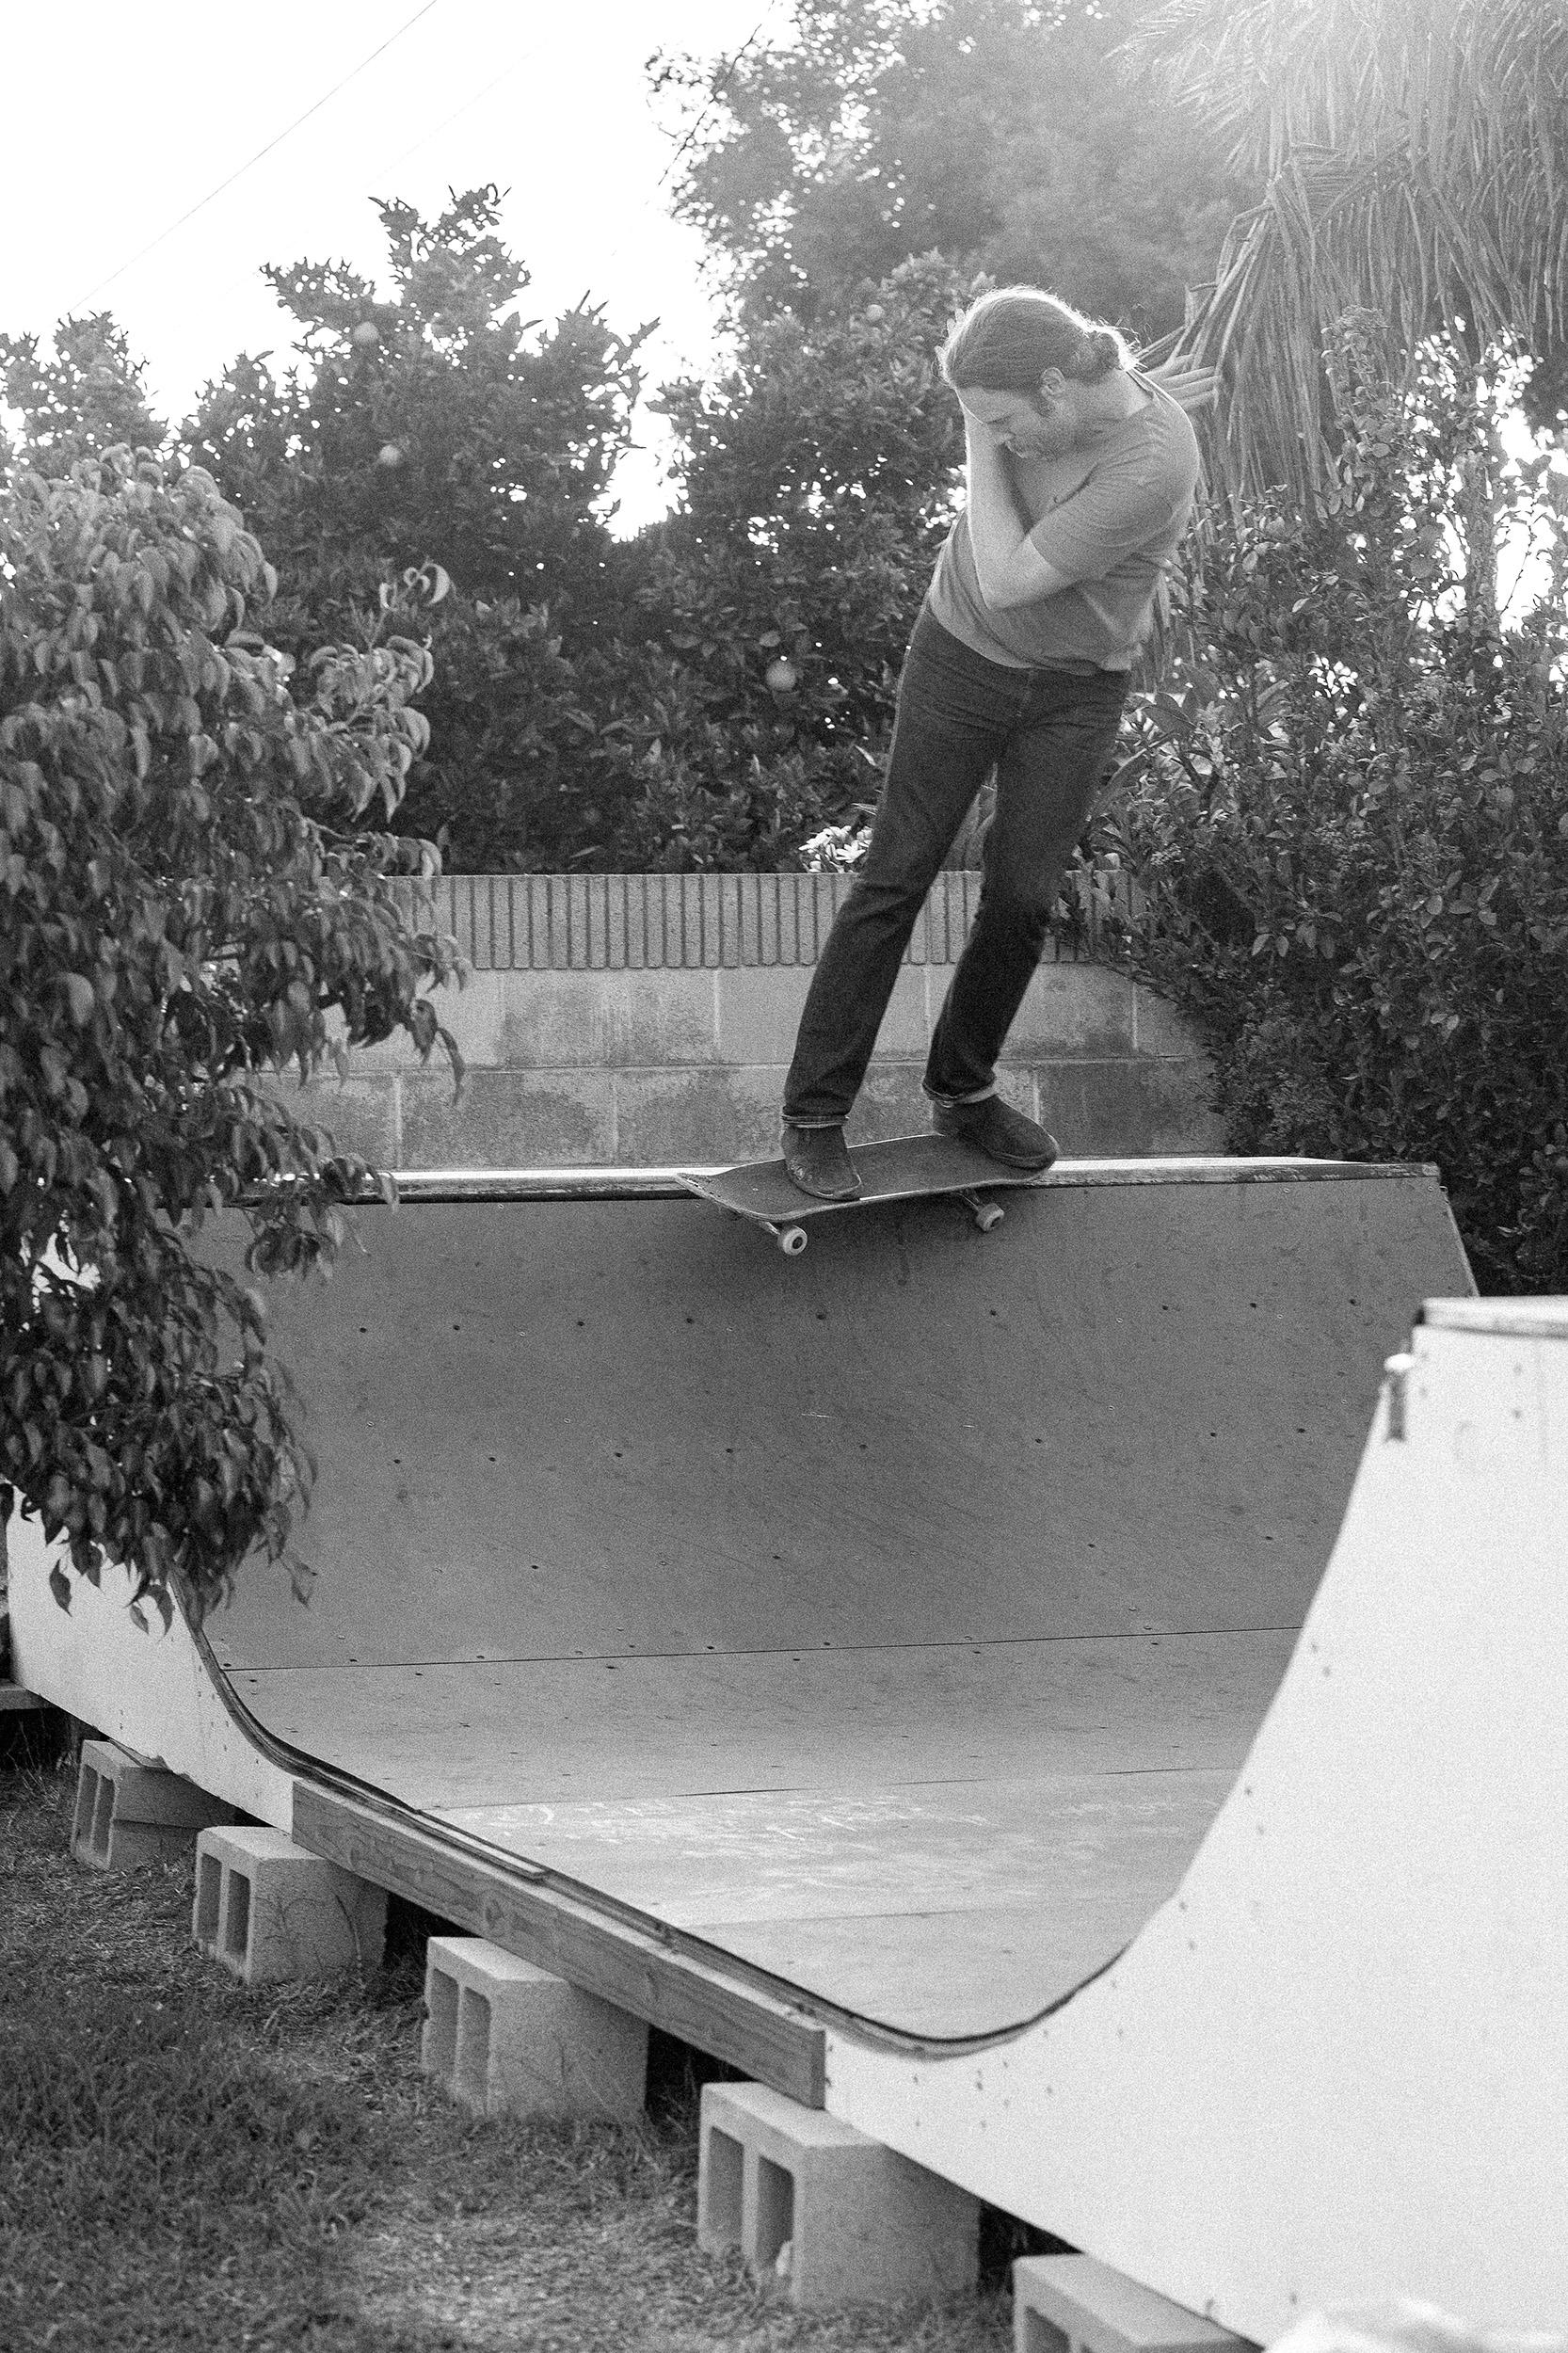 michael-stonis-skate-1.jpg